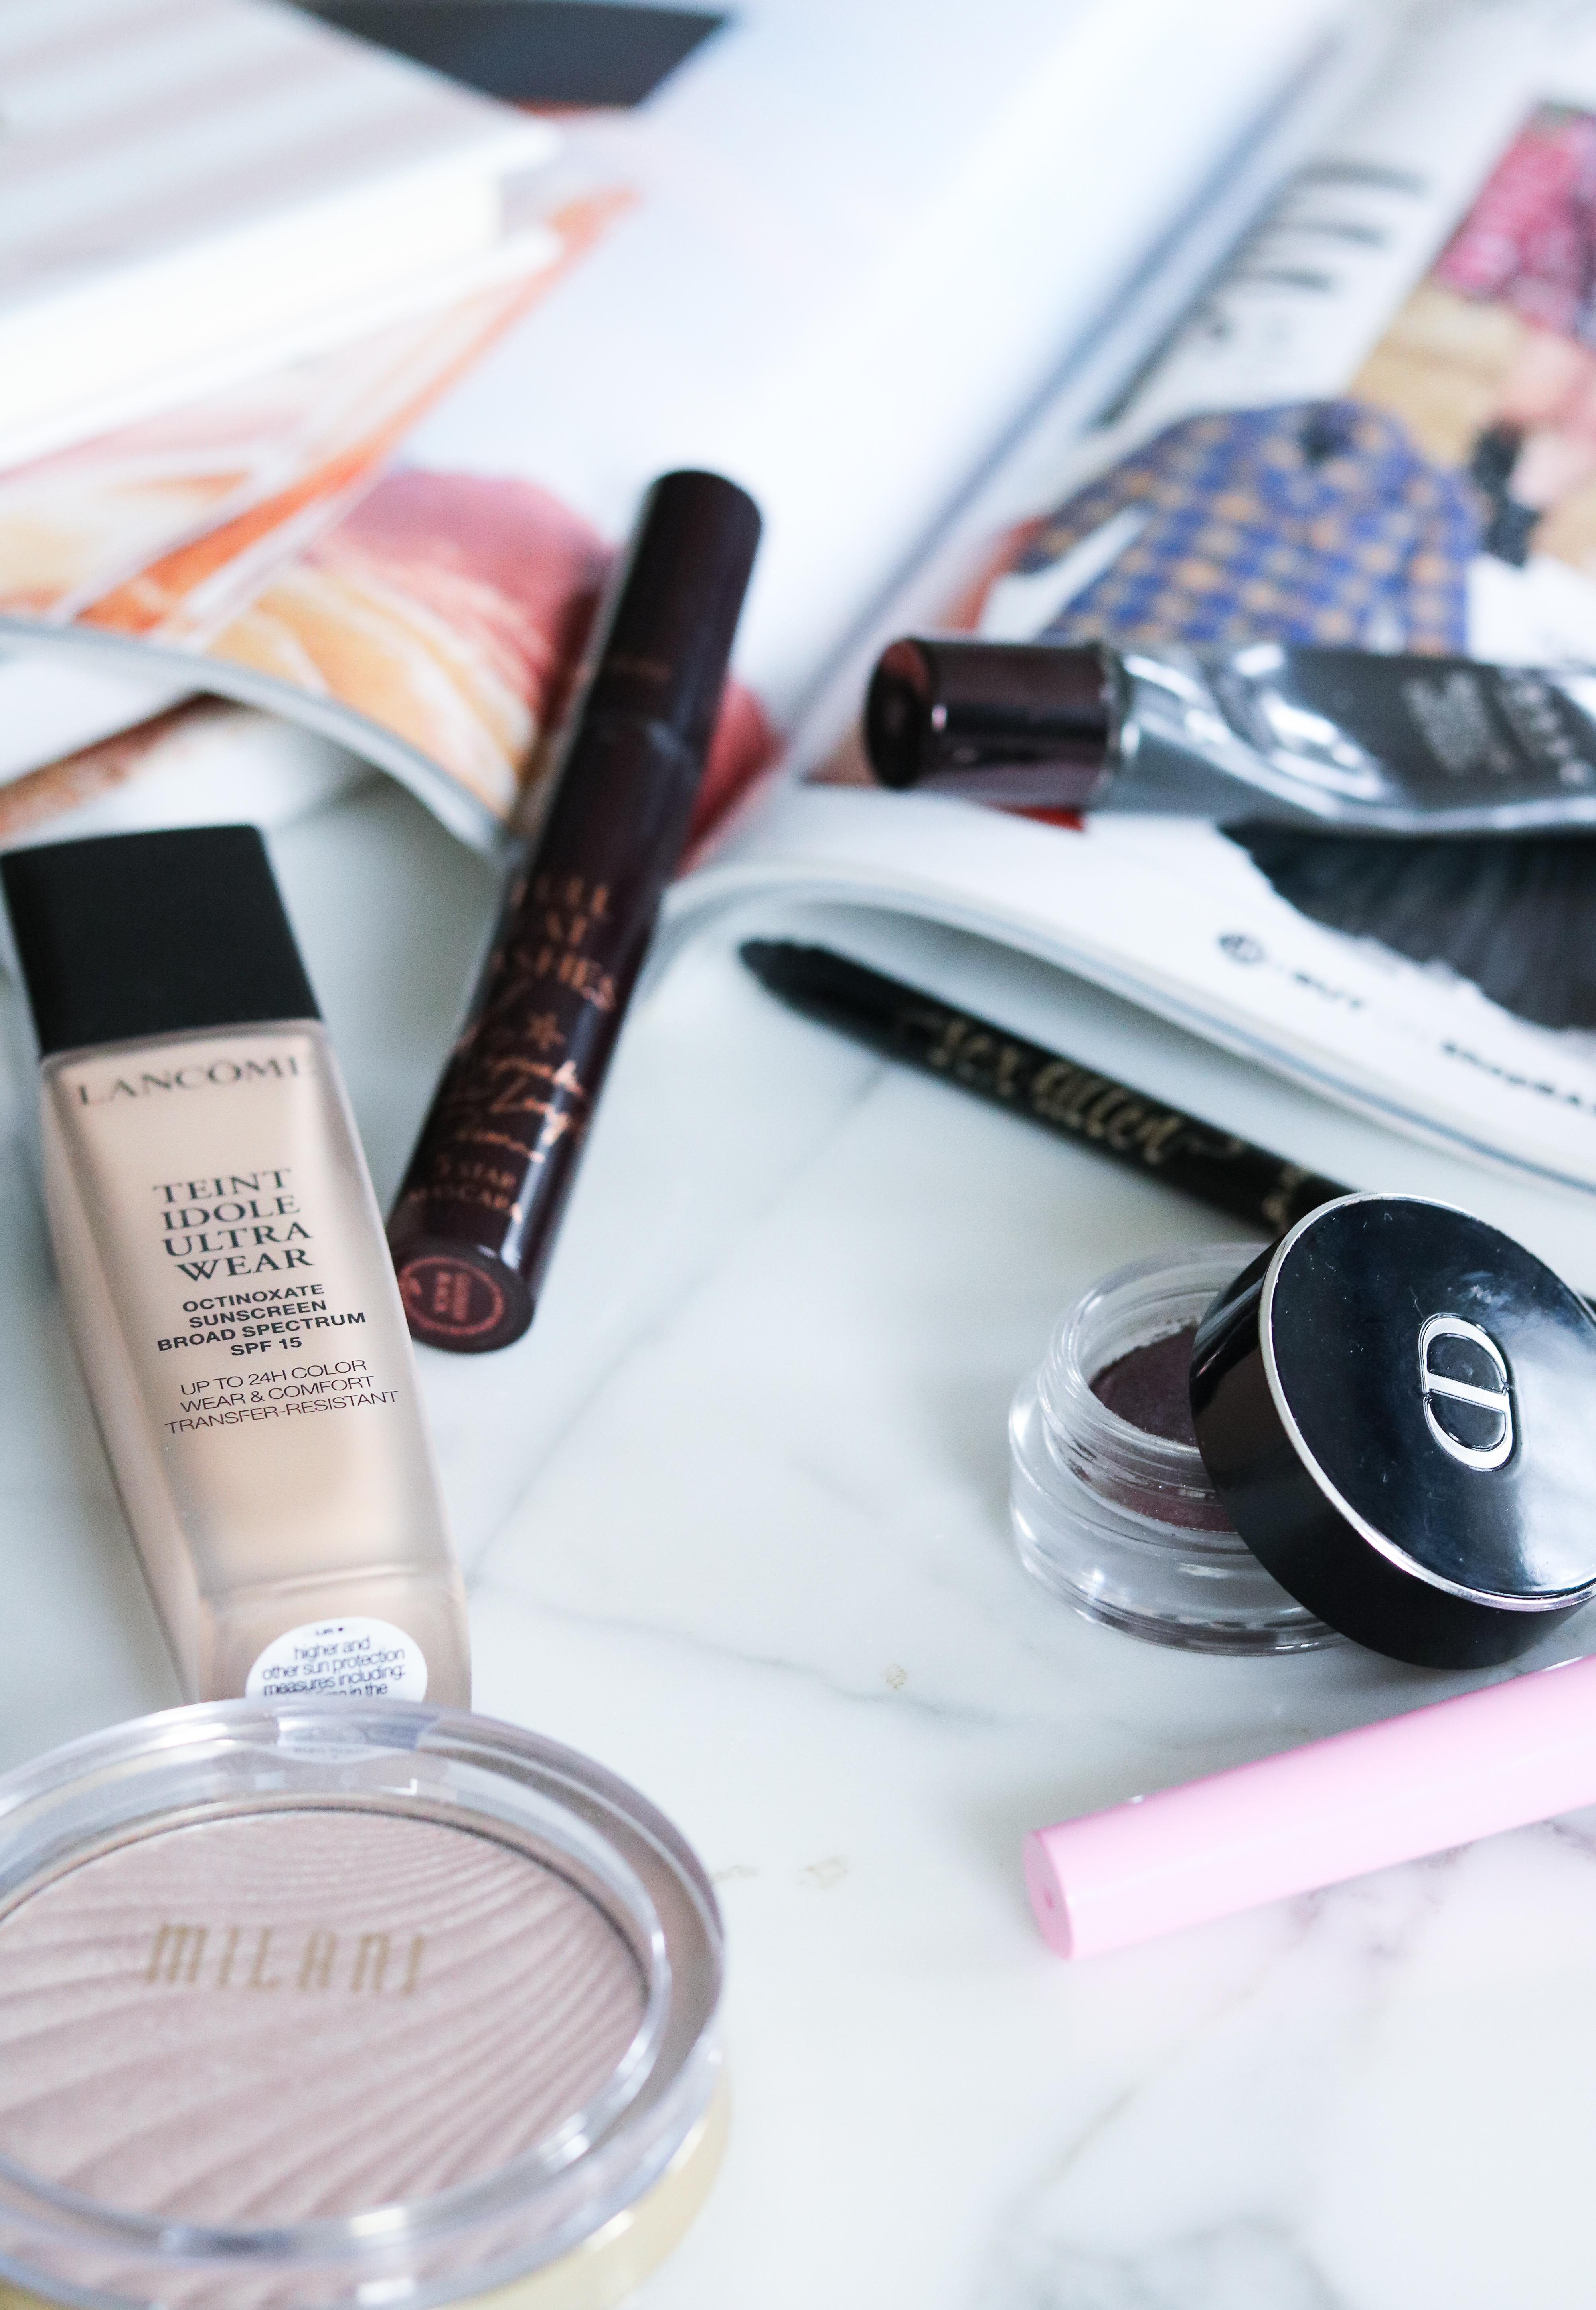 Best Beauty Blog Posts I Underrated Makeup Gems